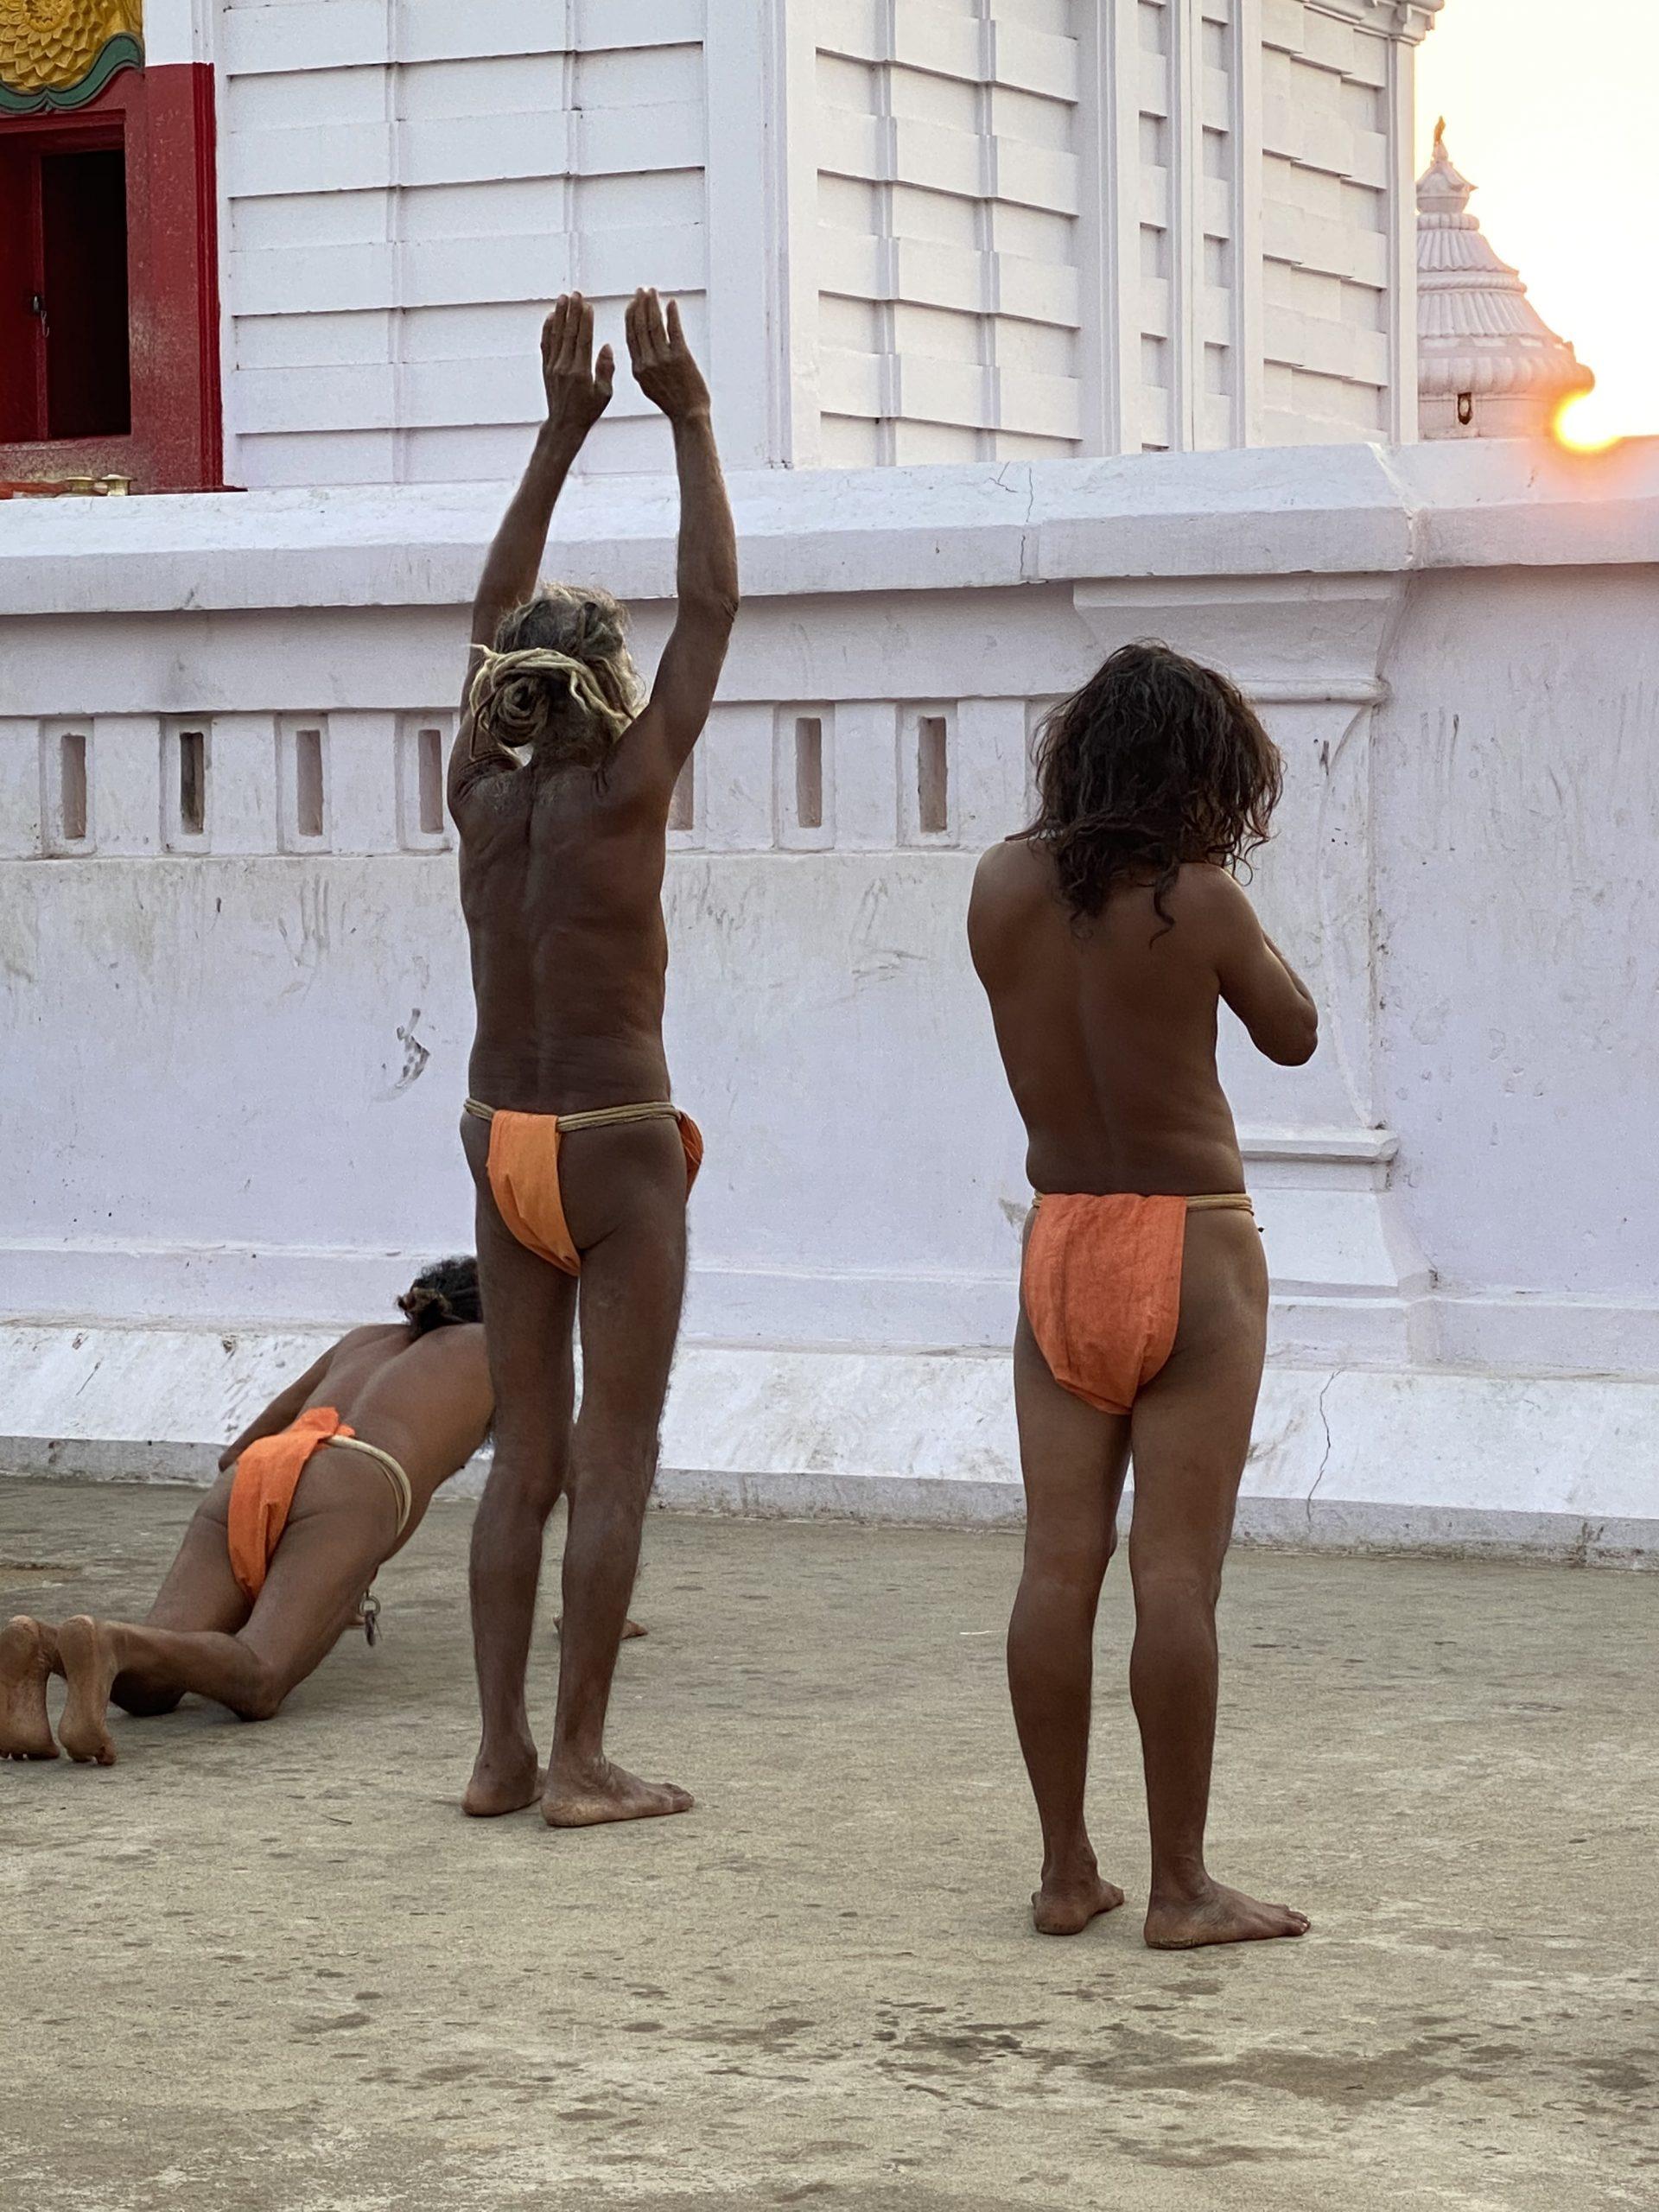 Después de BHUBANESWAR